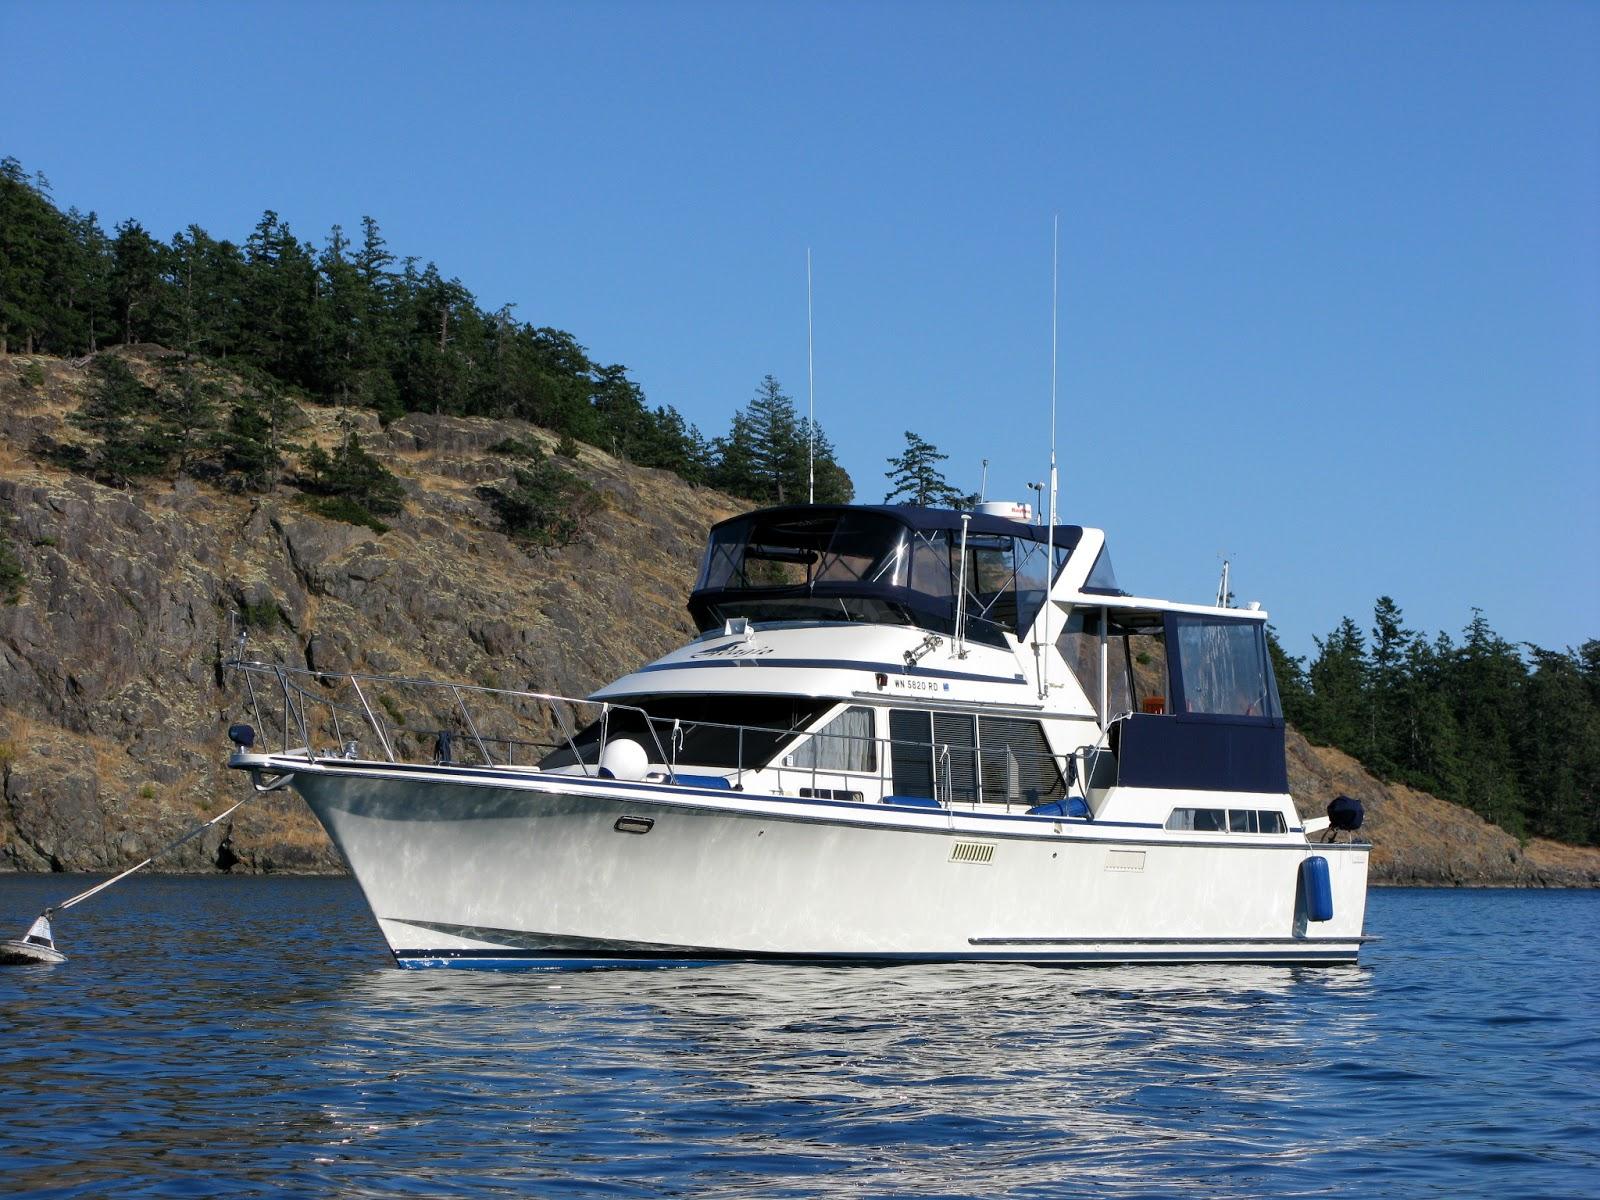 44 Tollycraft Sundeck Motor Yacht Adagio 174 950